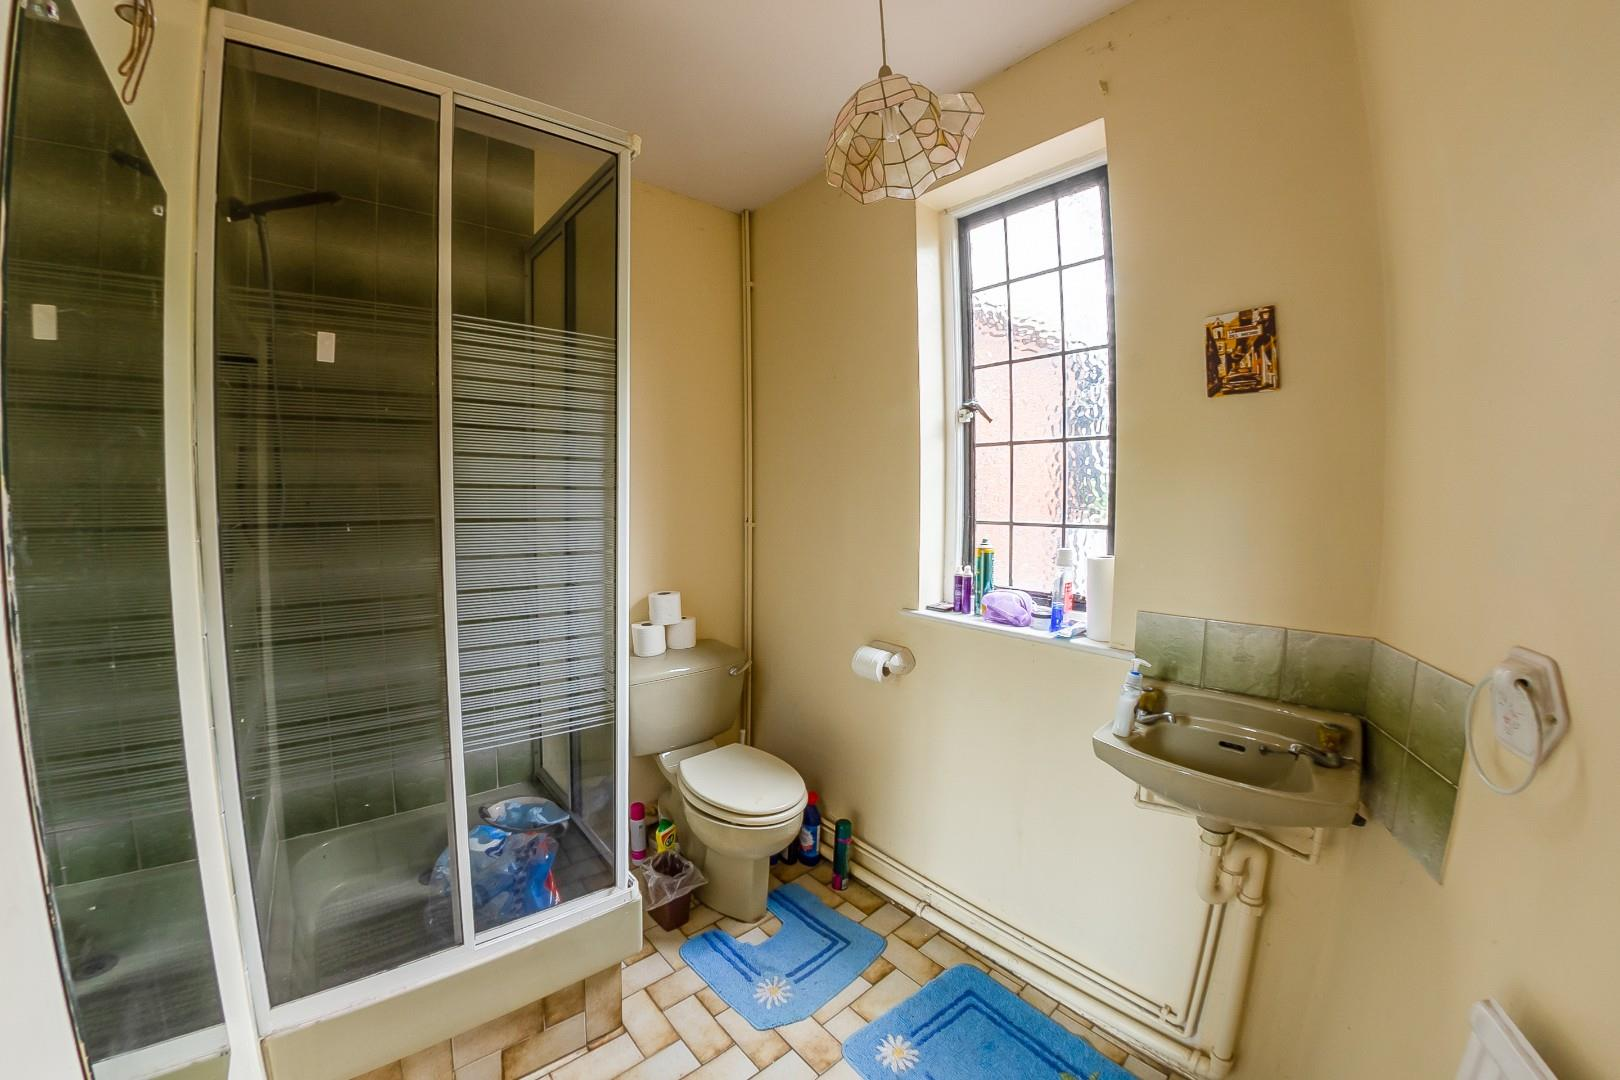 Shower & Toilet View.jpg